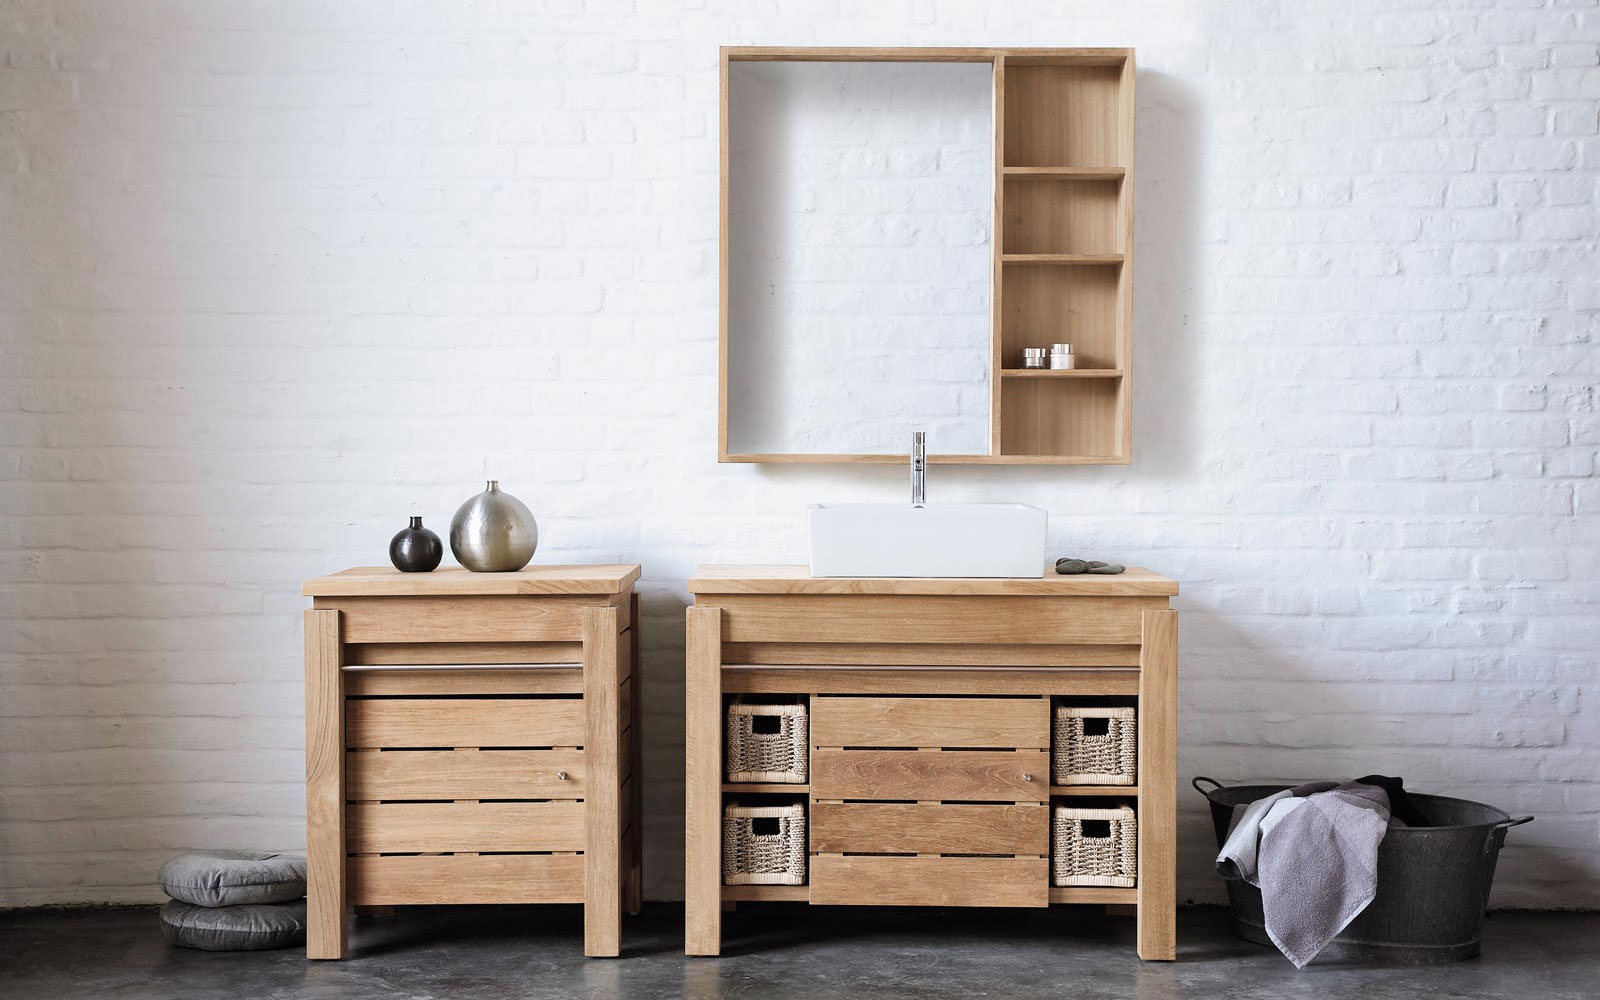 armoire salle de bain bois